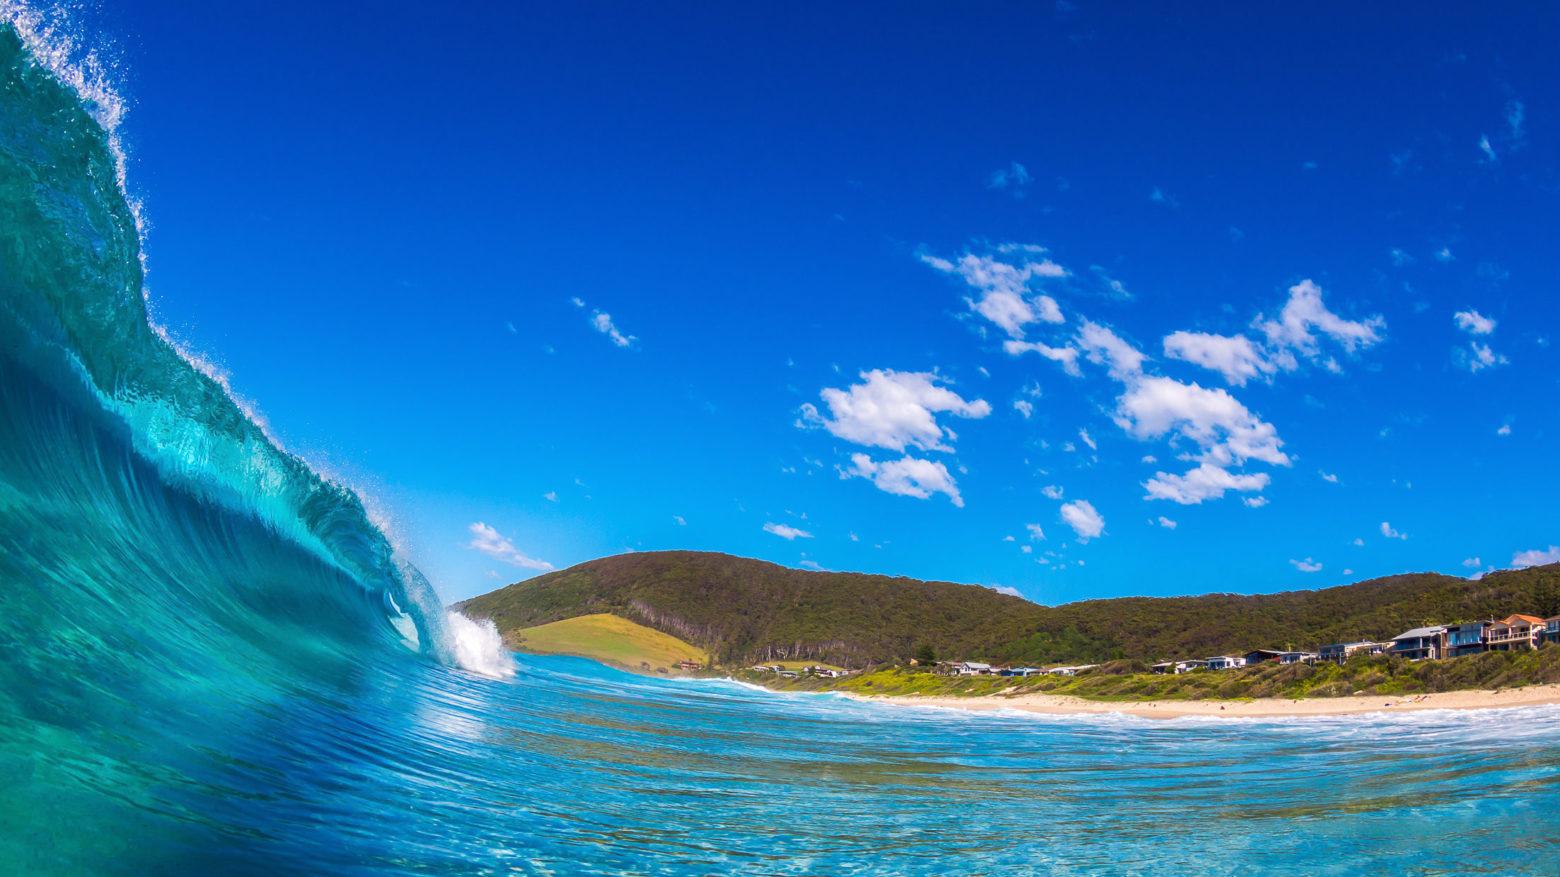 Blueys Beach (photo by Raw Edge Photography)